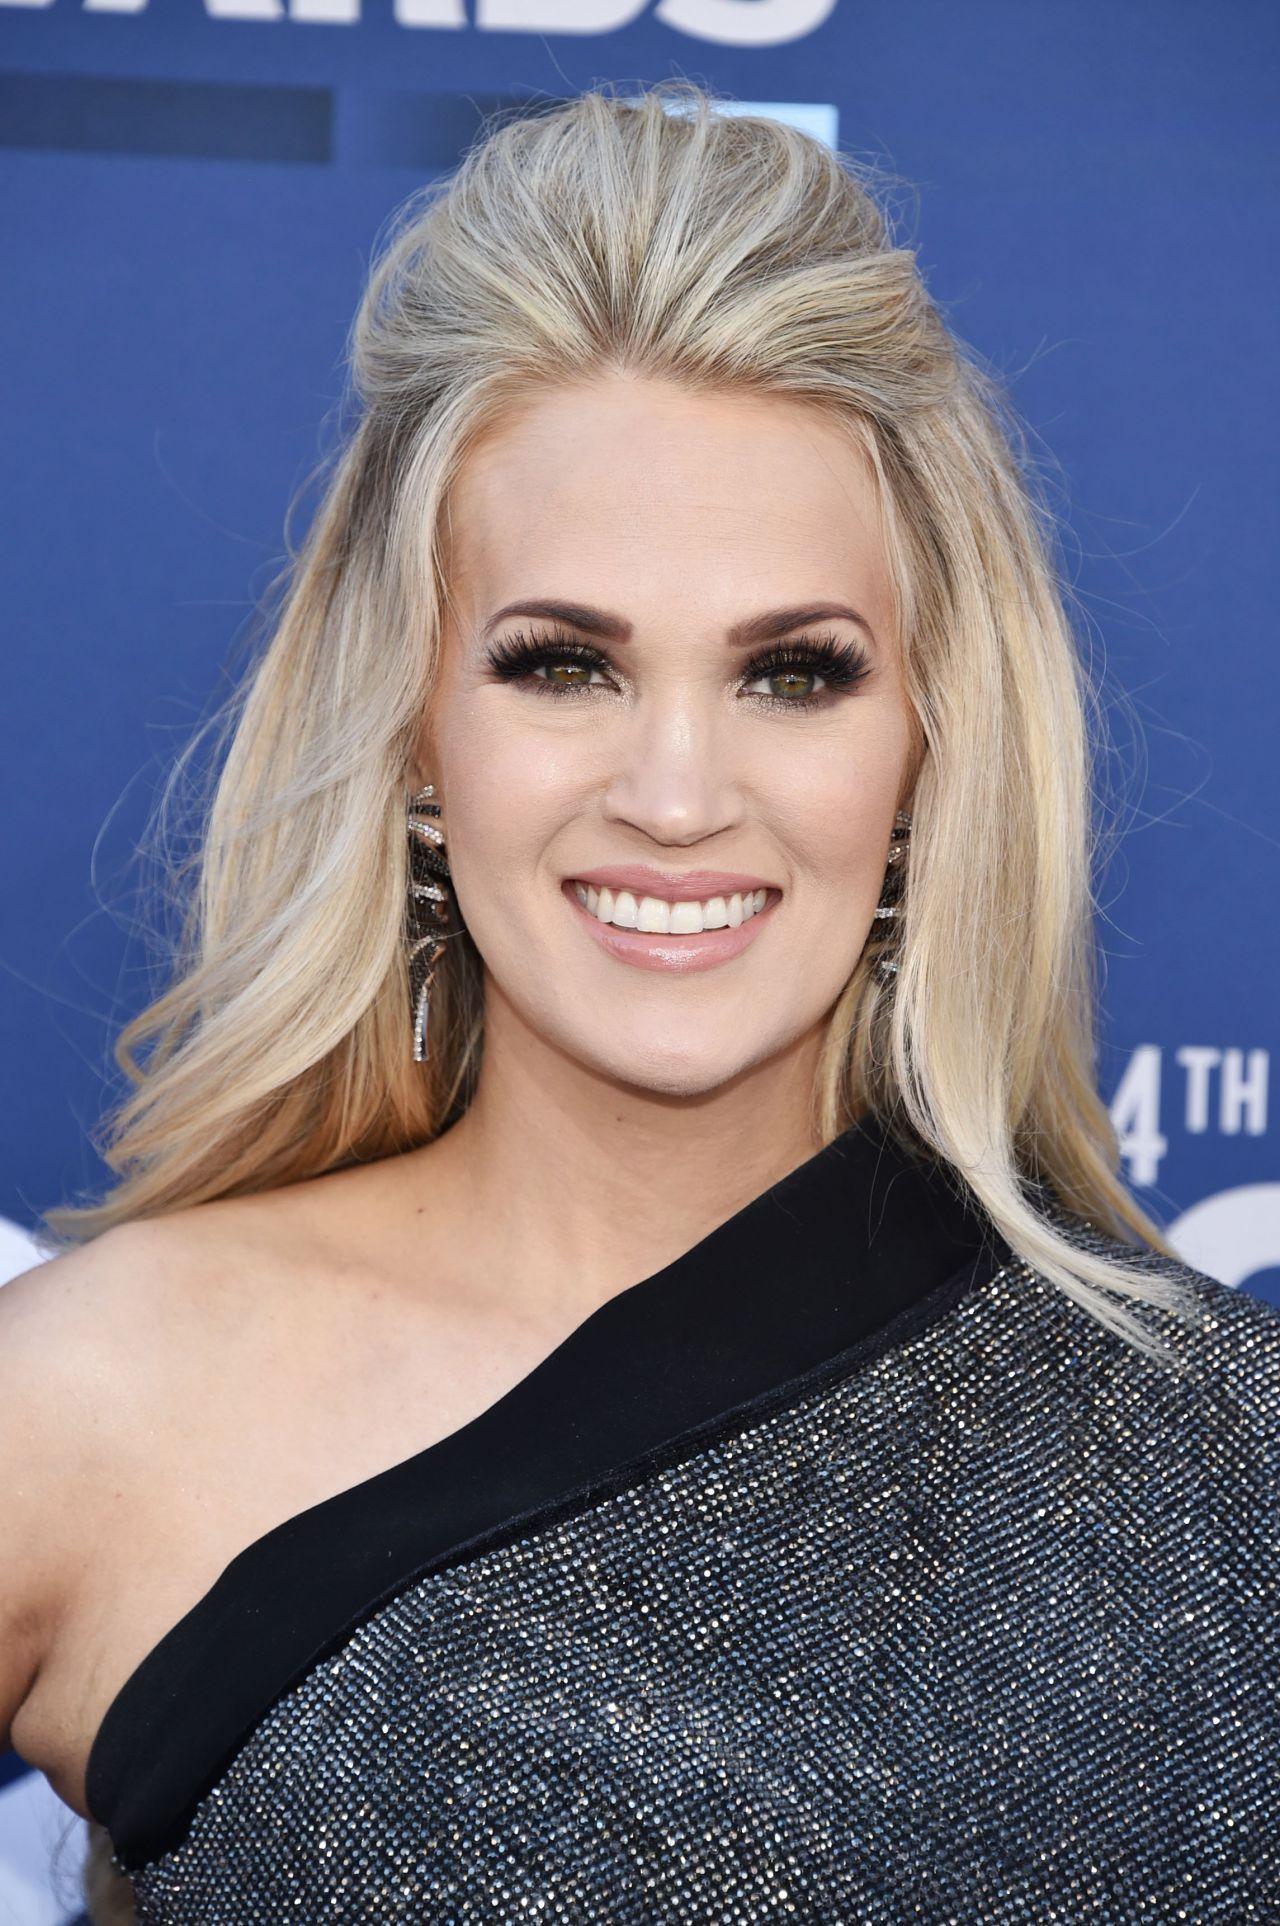 Carrie Underwood 2019 Acm Awards